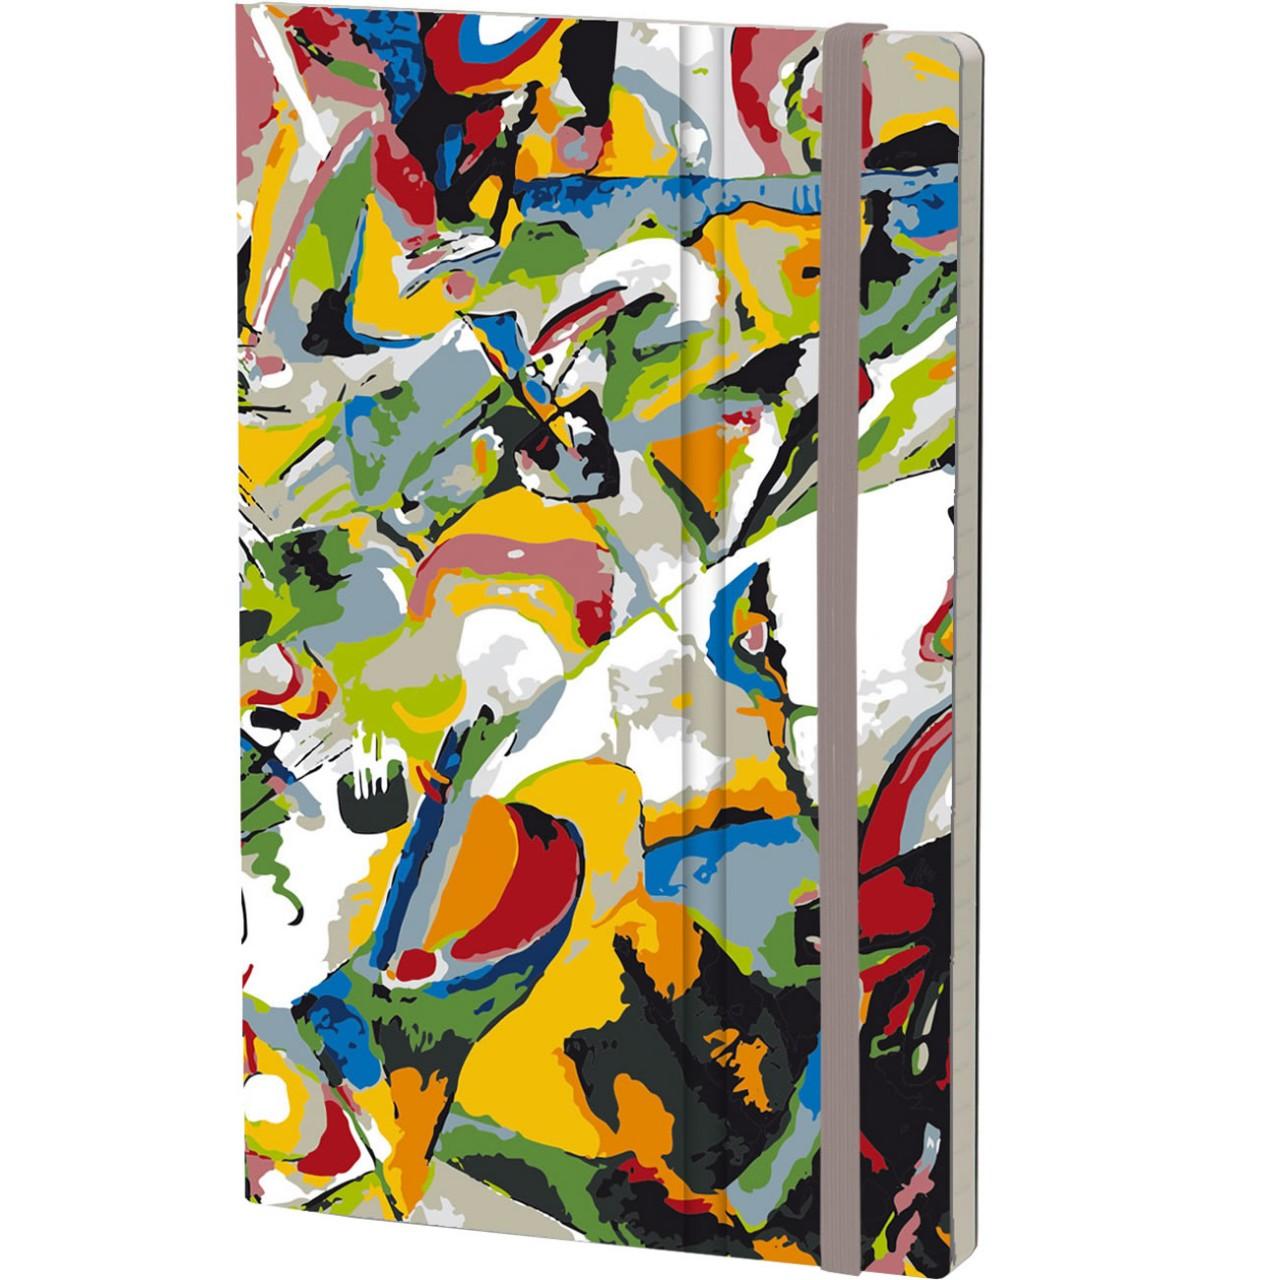 Stifflex Notizbuch ART 13 x 21 cm 192 S., KANDINSKY